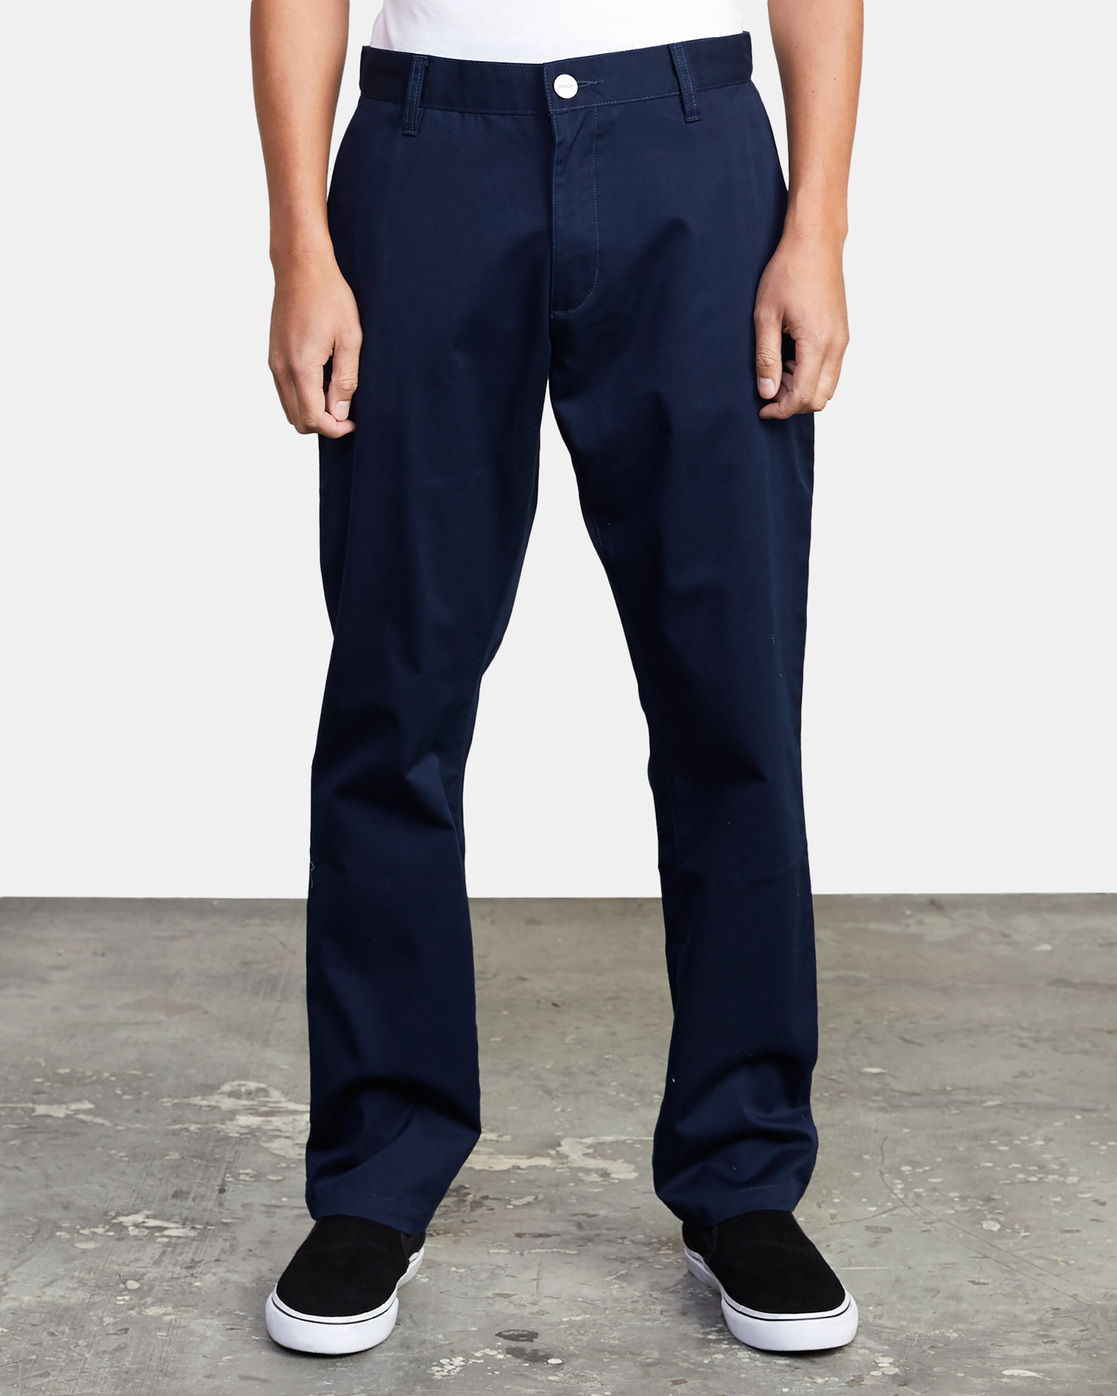 0 week-end Stretch straight fit Pant Blue M3493RWS RVCA